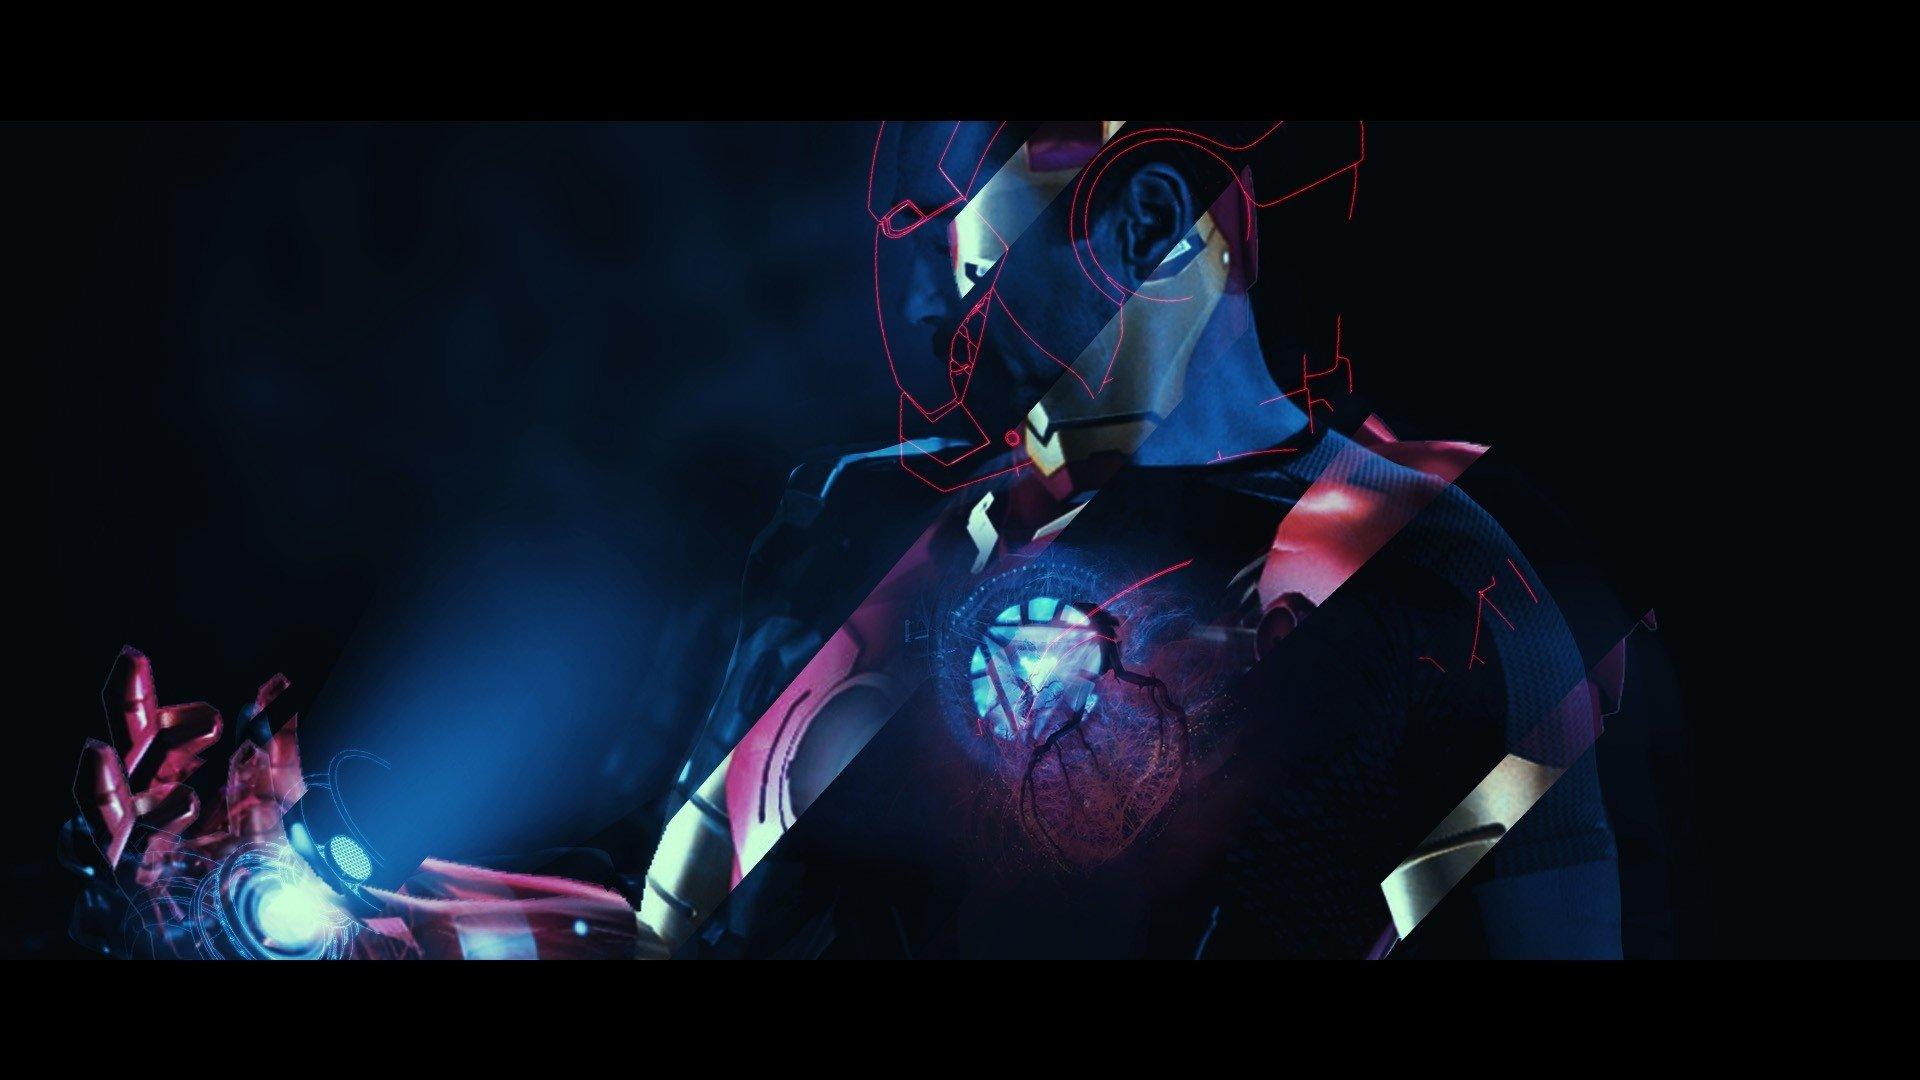 Iron man 3 full hd fond d 39 cran and arri re plan 1920x1080 id 418951 - Iron man telecharger ...